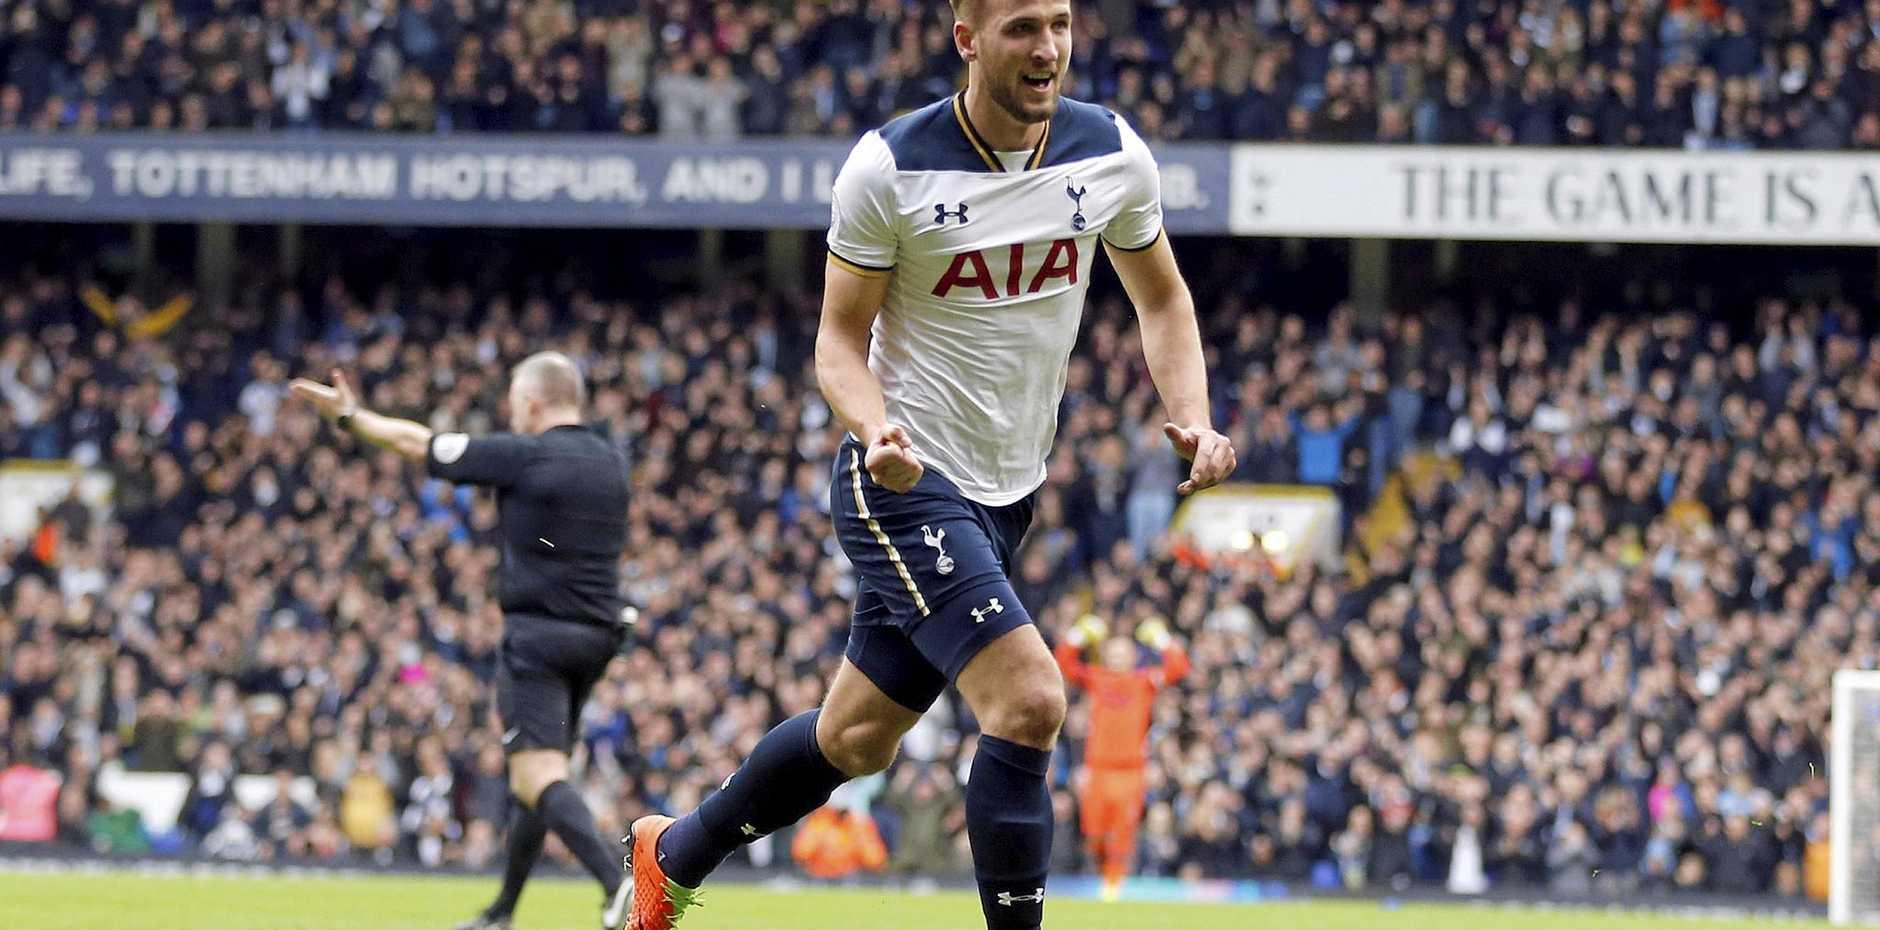 Tottenham Hotspur's Harry Kane celebrates after scoring his side's second goal against Stoke.